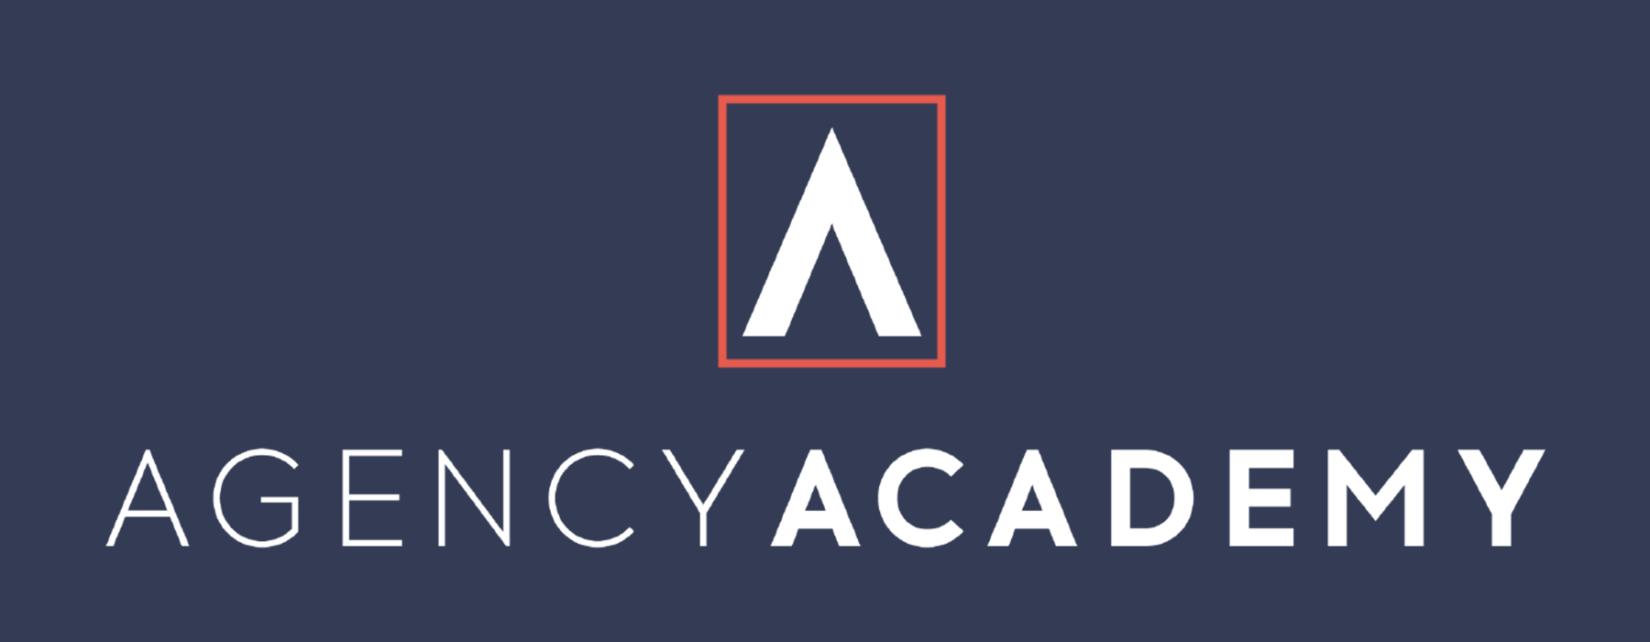 Agency Academy